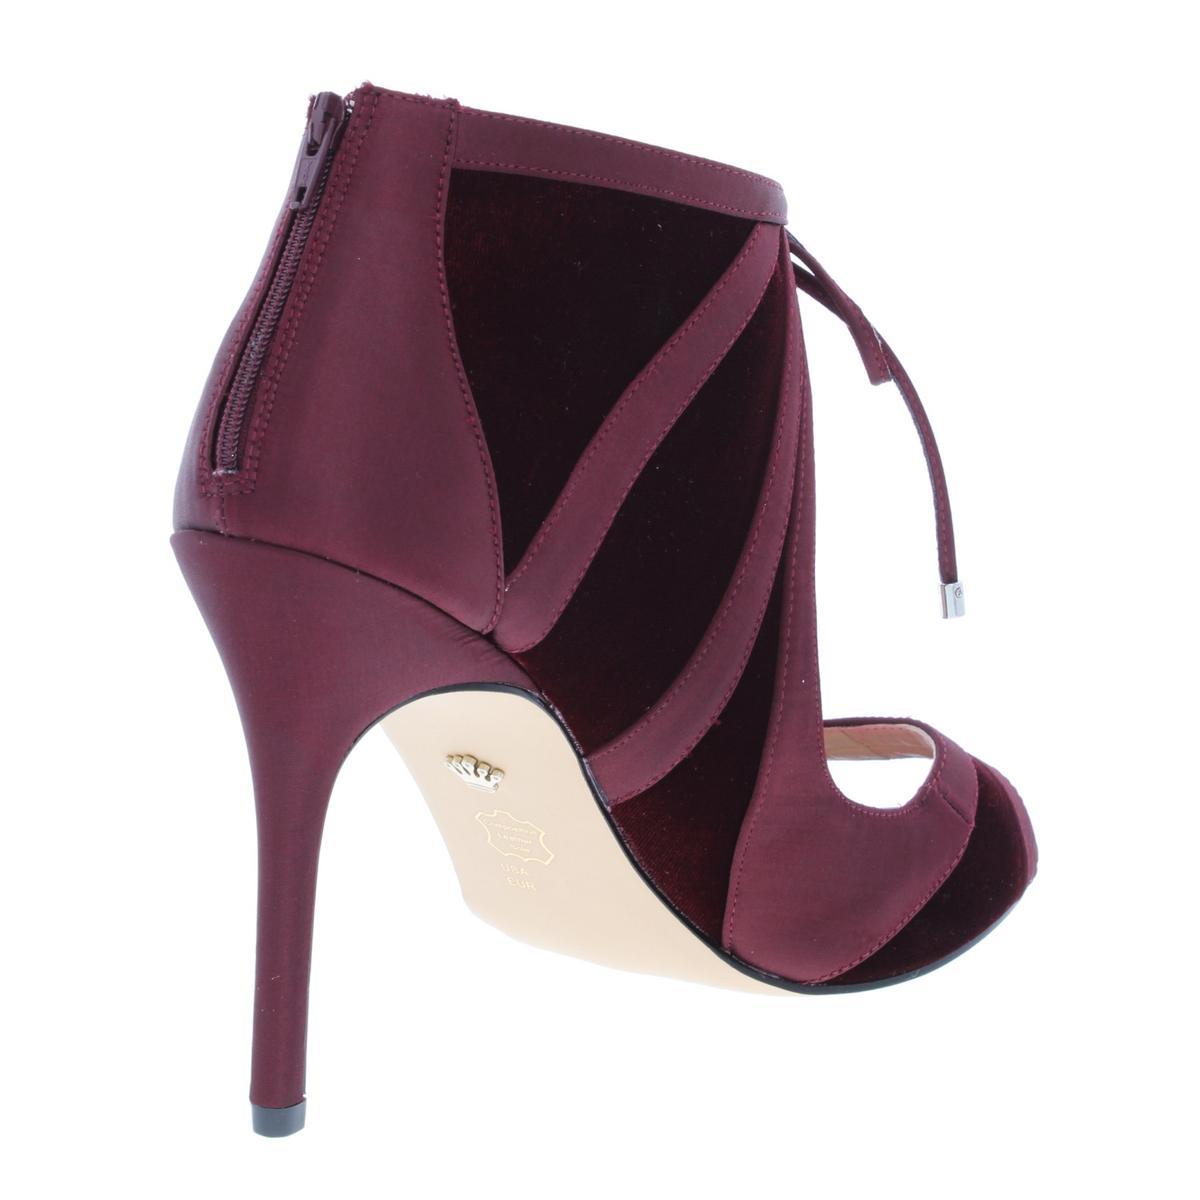 Nina-Womens-Cherie-Heels-Evening-Sandals-Shoes-BHFO-6446 thumbnail 4